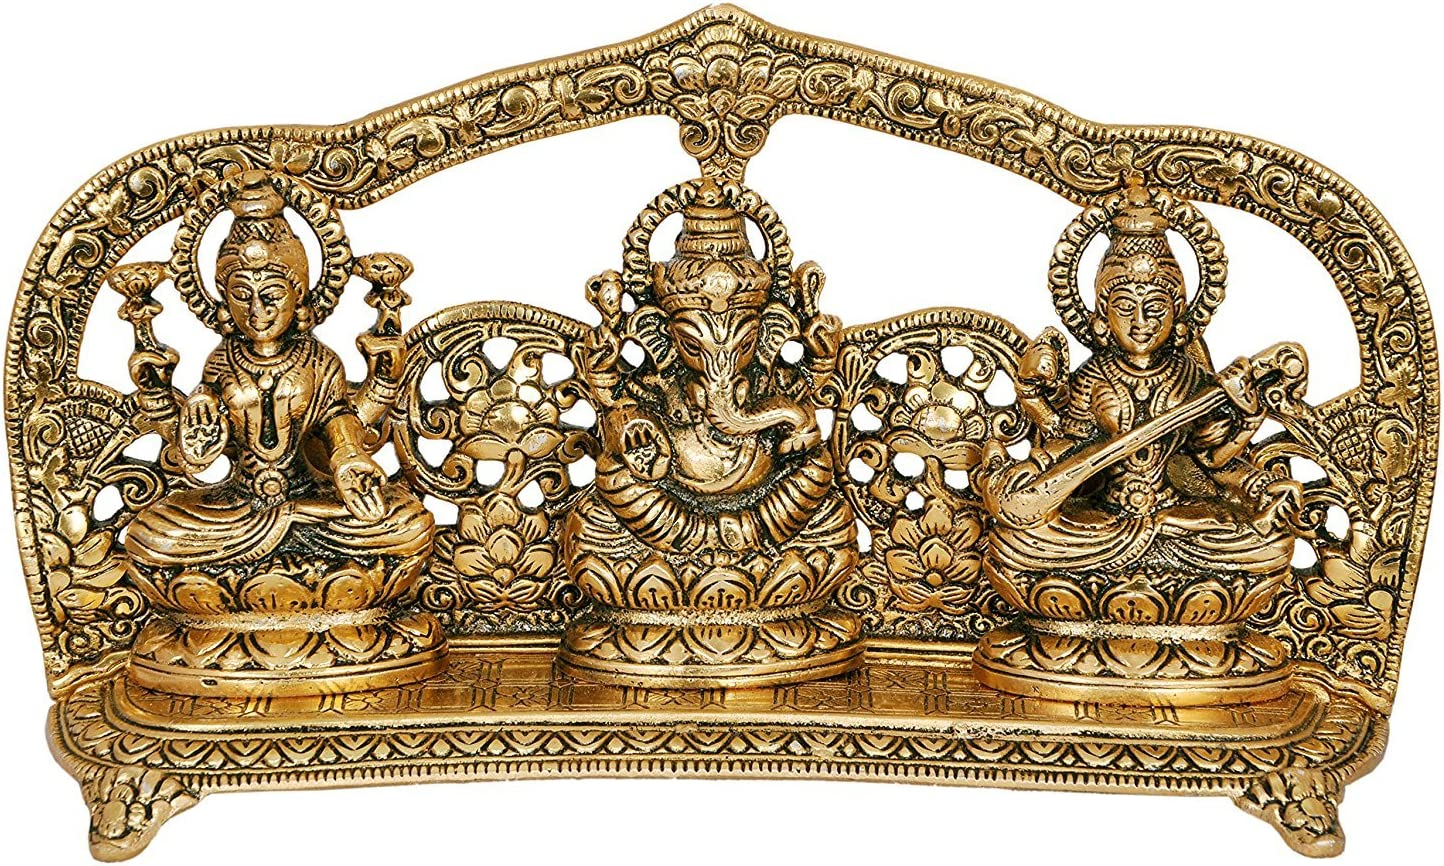 CraftVatika Goddess Laxmi Ganesha Saraswati Idol - Lakshmi Ganesh Saraswati Murti - Decorative Item - Showpiece Idols Statue - Home Decor